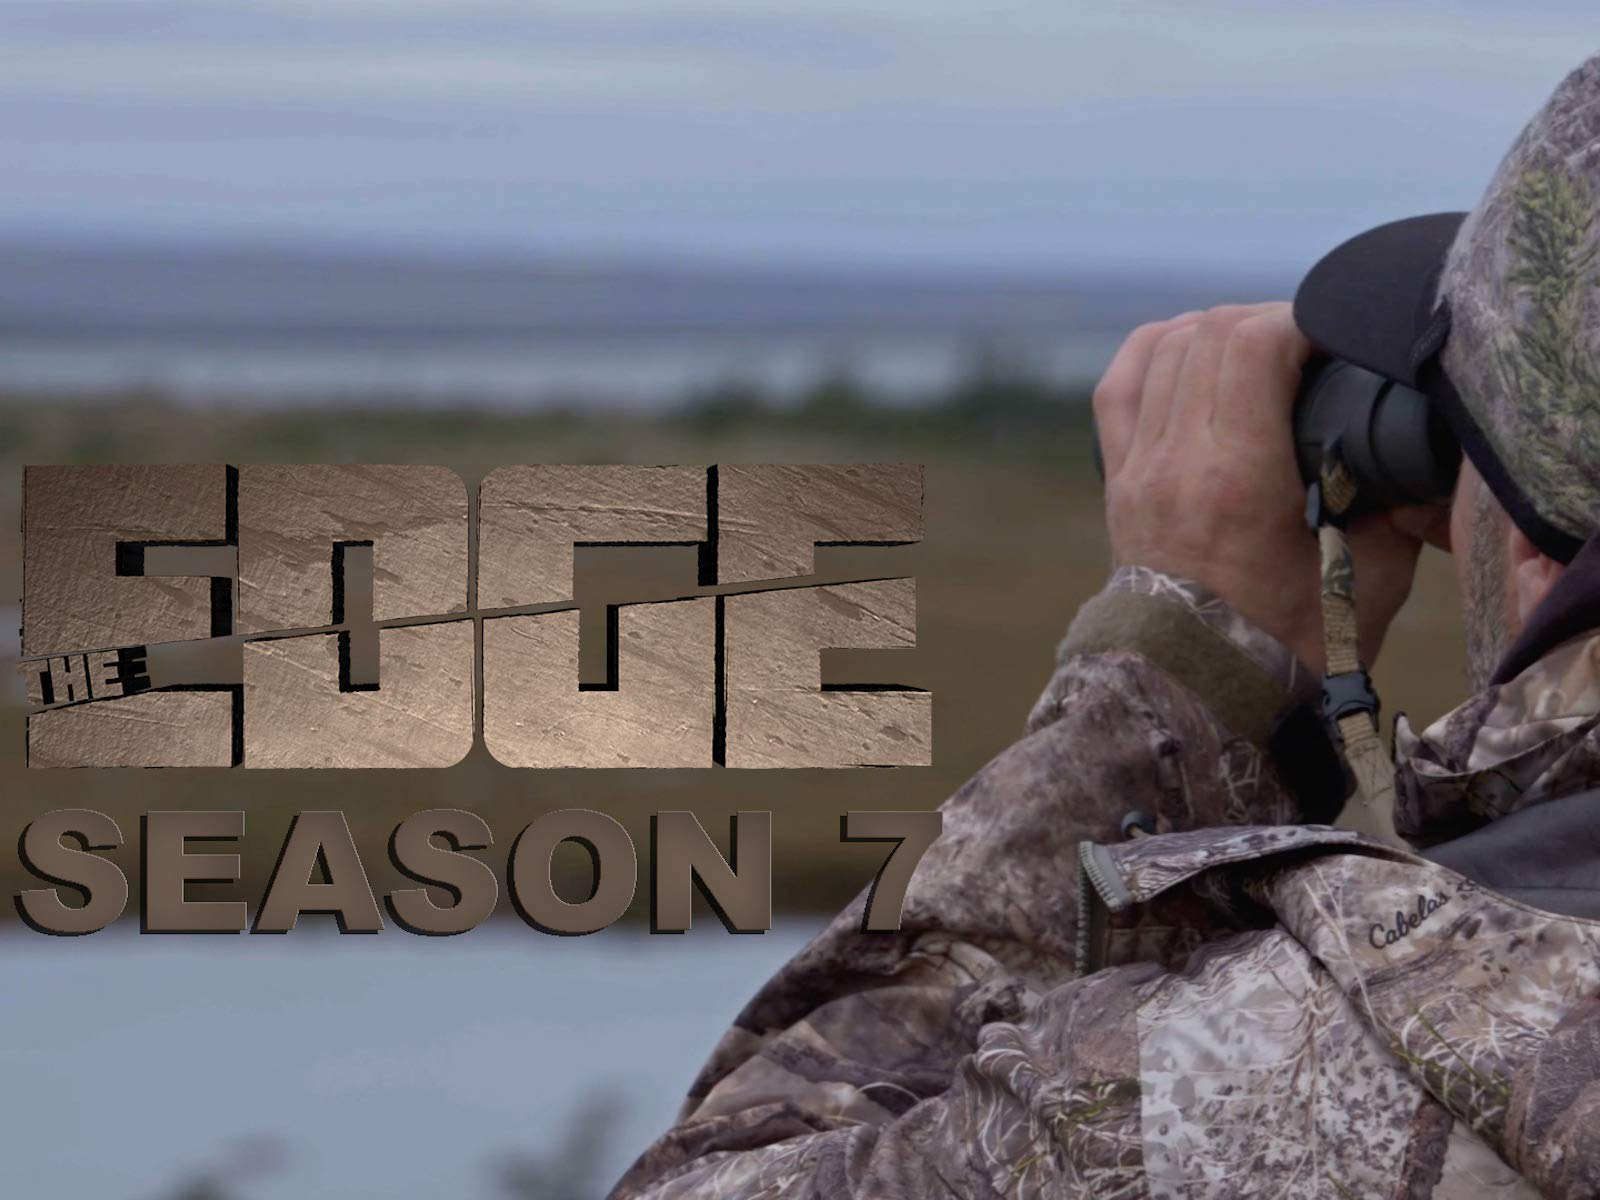 The Edge - Season 7